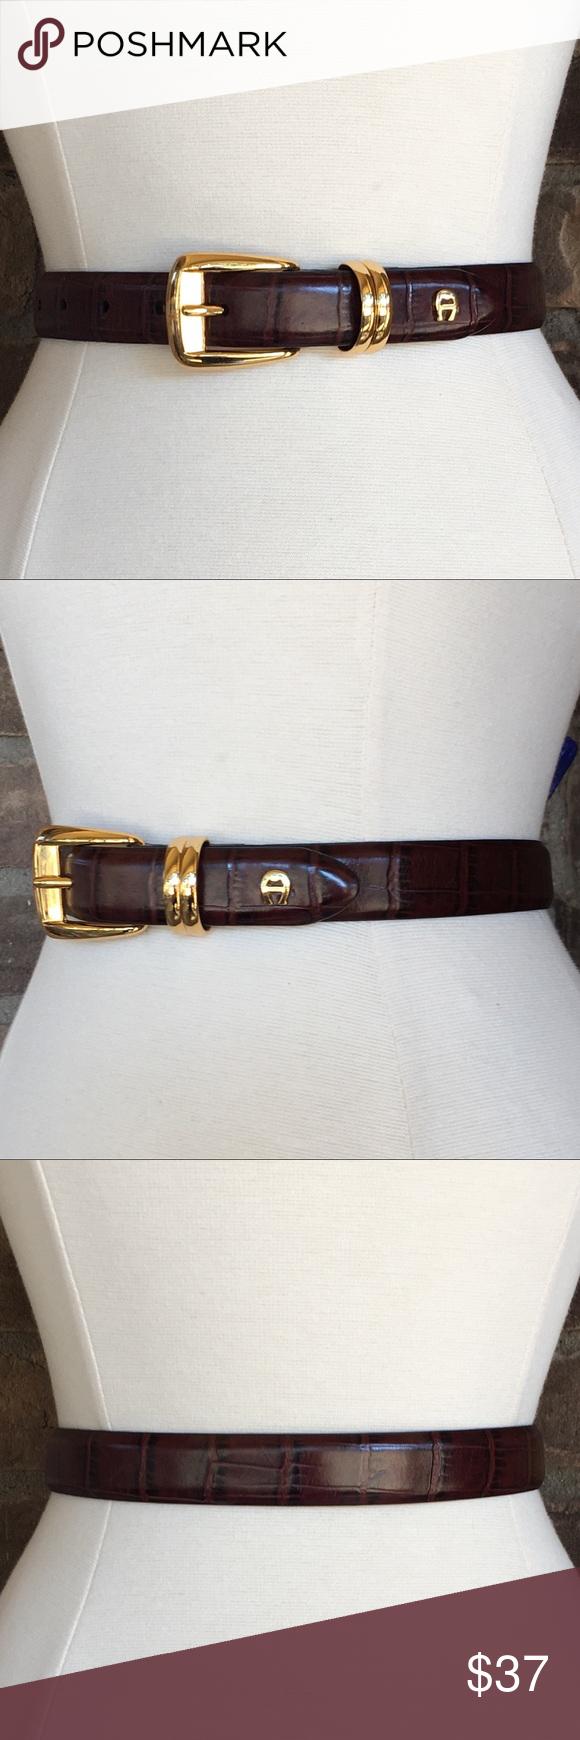 Etienne Aigner Brown Leather Croc Belt Gold Buckle Belt Aigner Brown Leather